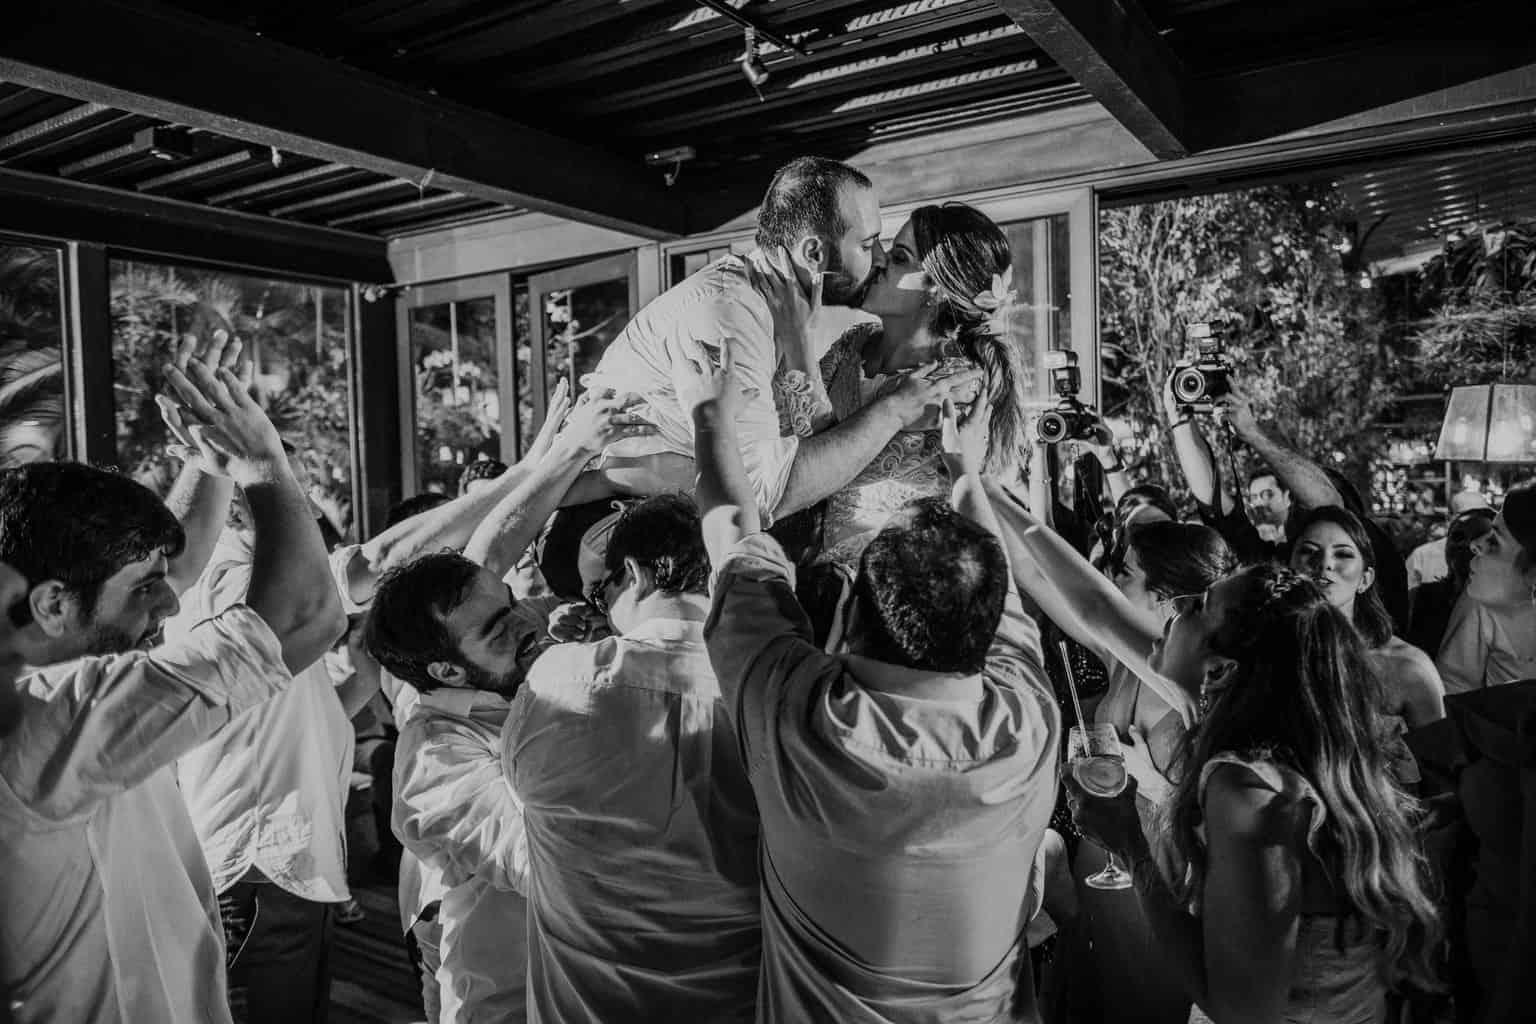 casamento-na-serra-festa-de-casamento-Fotografia-Renata-Xavier-Les-Amies-Cerimonial-Locanda-Della-Mimosa-Natalia-e-Bruno-noivos-na-pista705